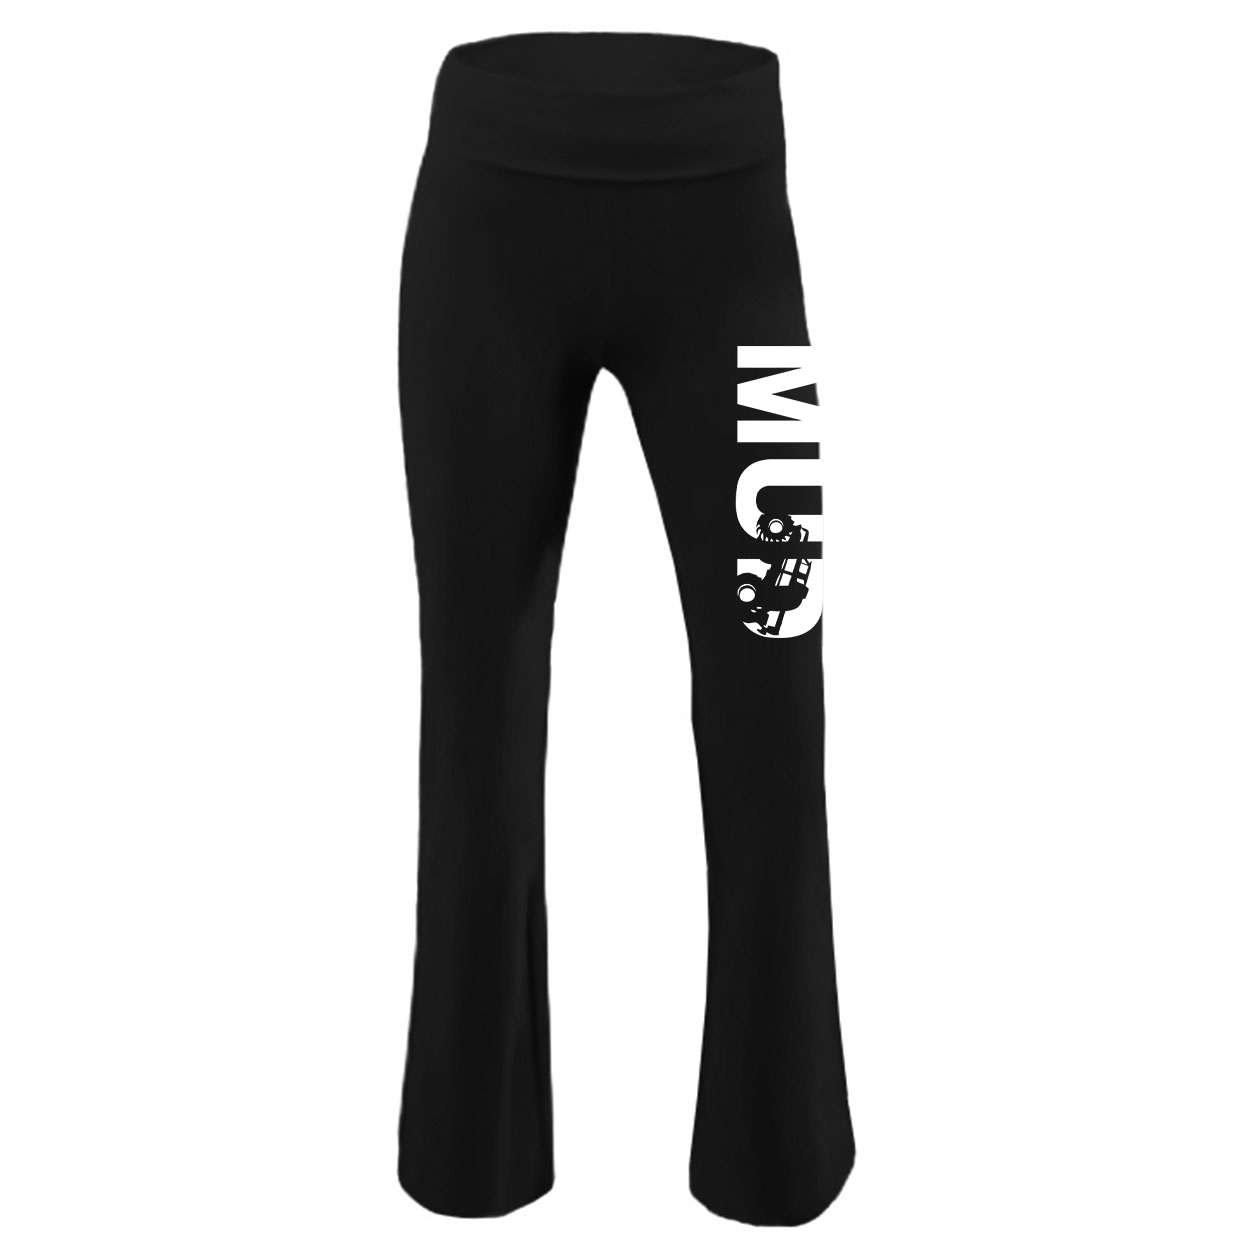 Mud Truck Logo Classic Youth Girls Yoga Pants Black (White Logo)